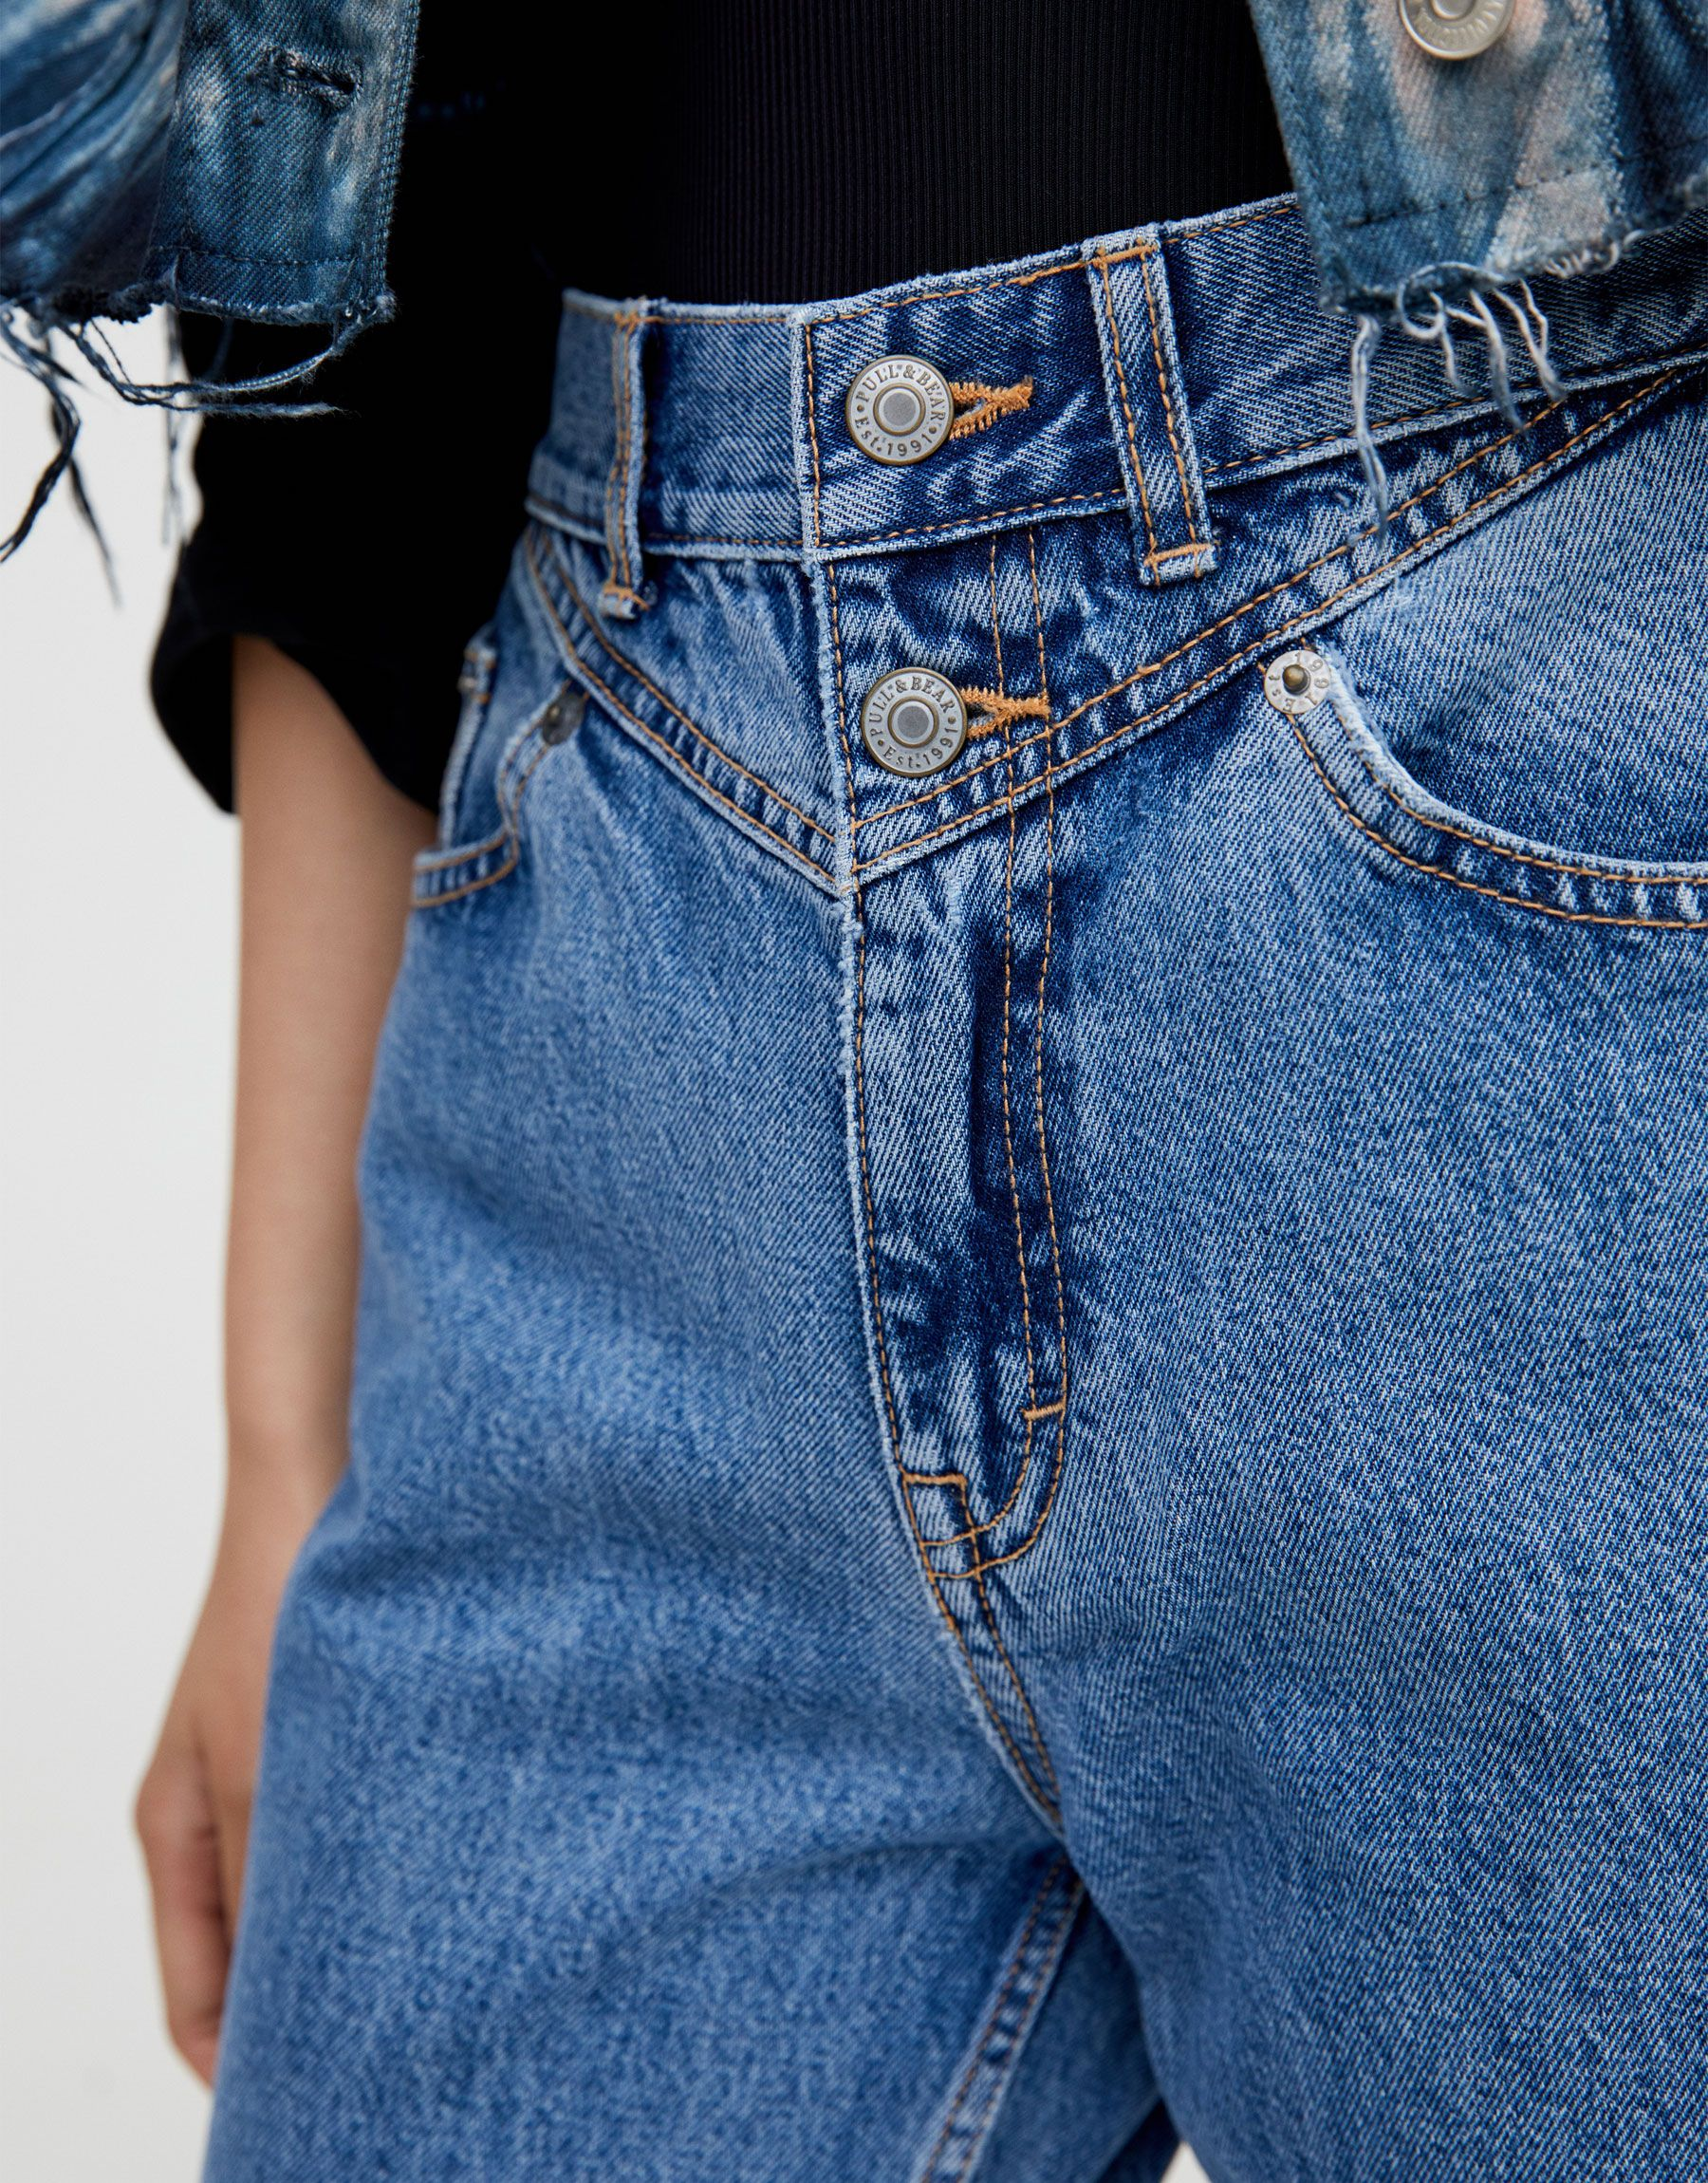 Pull Bear Female Jeans Mom Fit Canesu Azul Clar 42 Denim Details Denim Women Mom Jeans